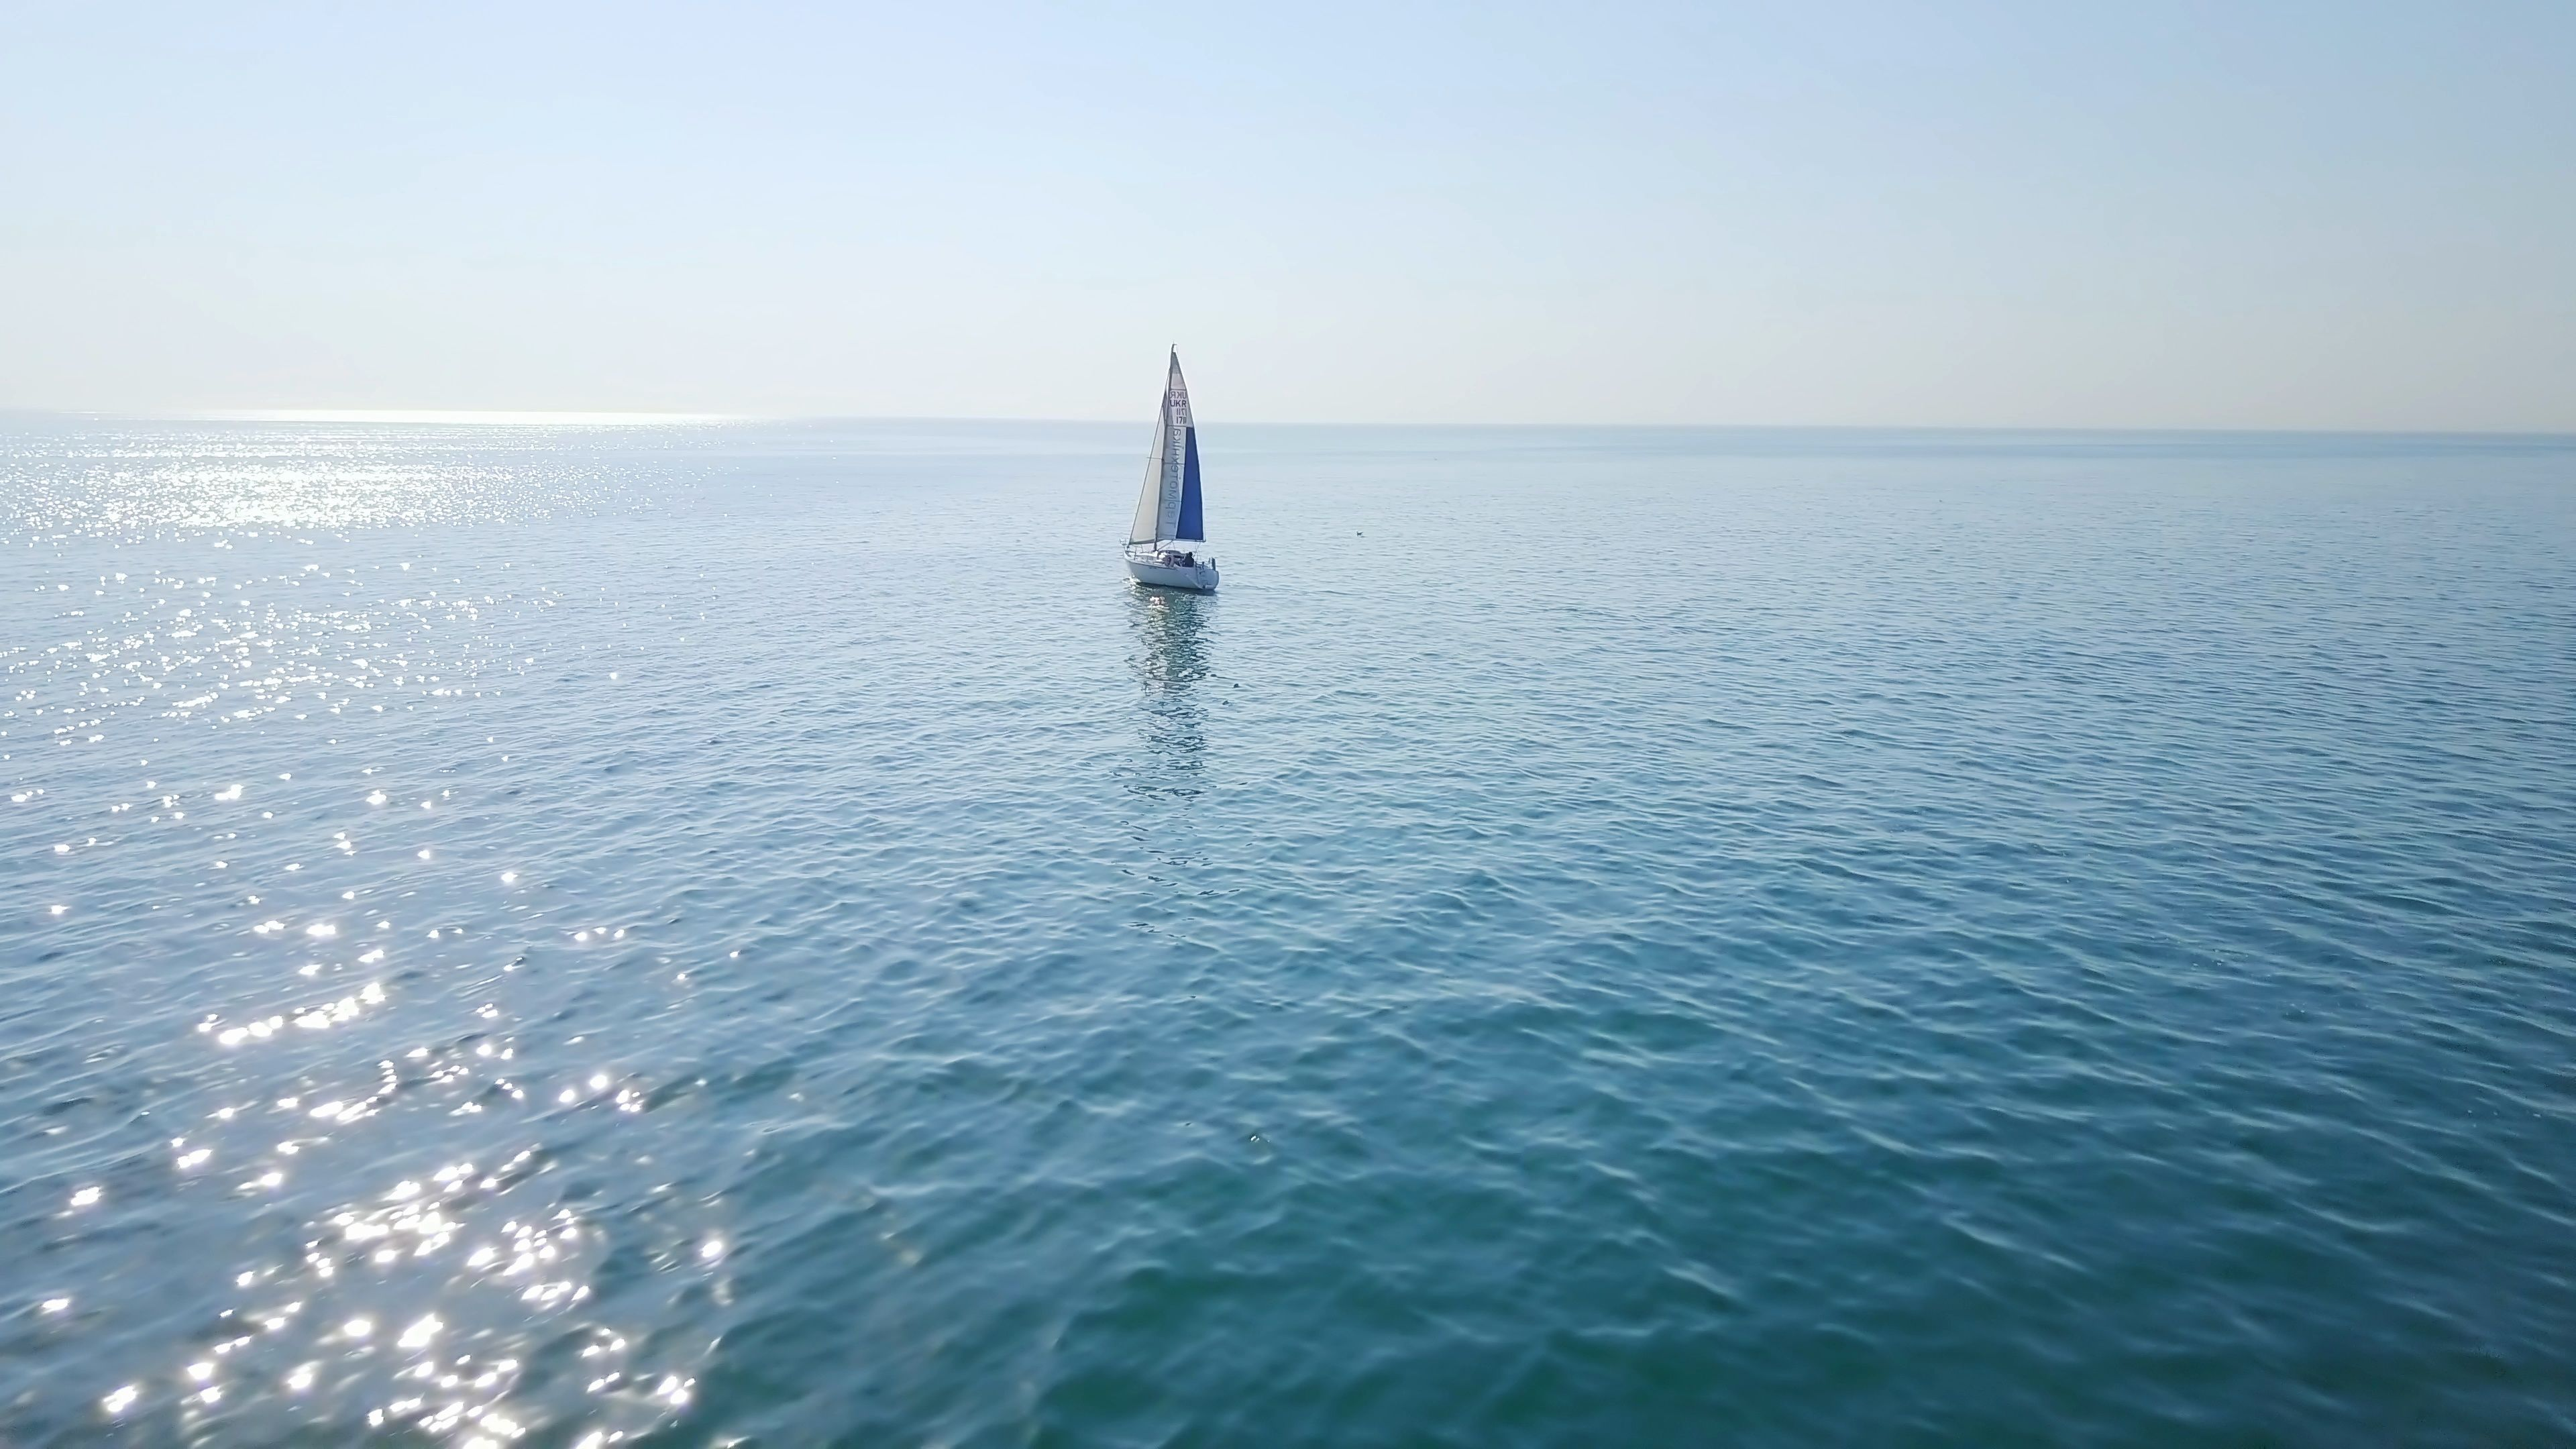 Luxury Yacht Sailing On Opened Sea At Sunrise Drone Footage Stock